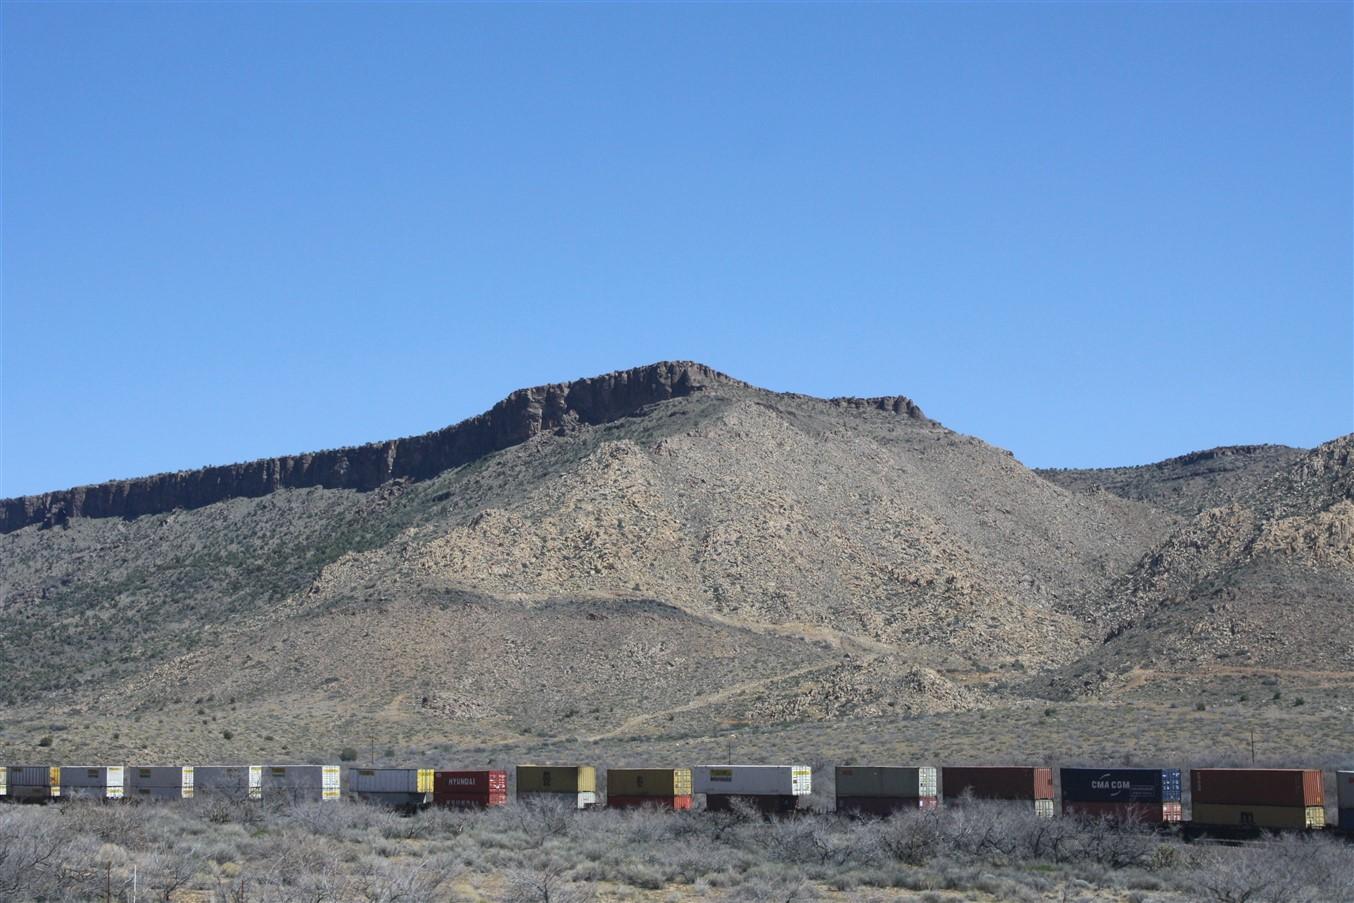 2012 03 14 Route 66 Road Trip 163 Peach Springs Arizona.jpg